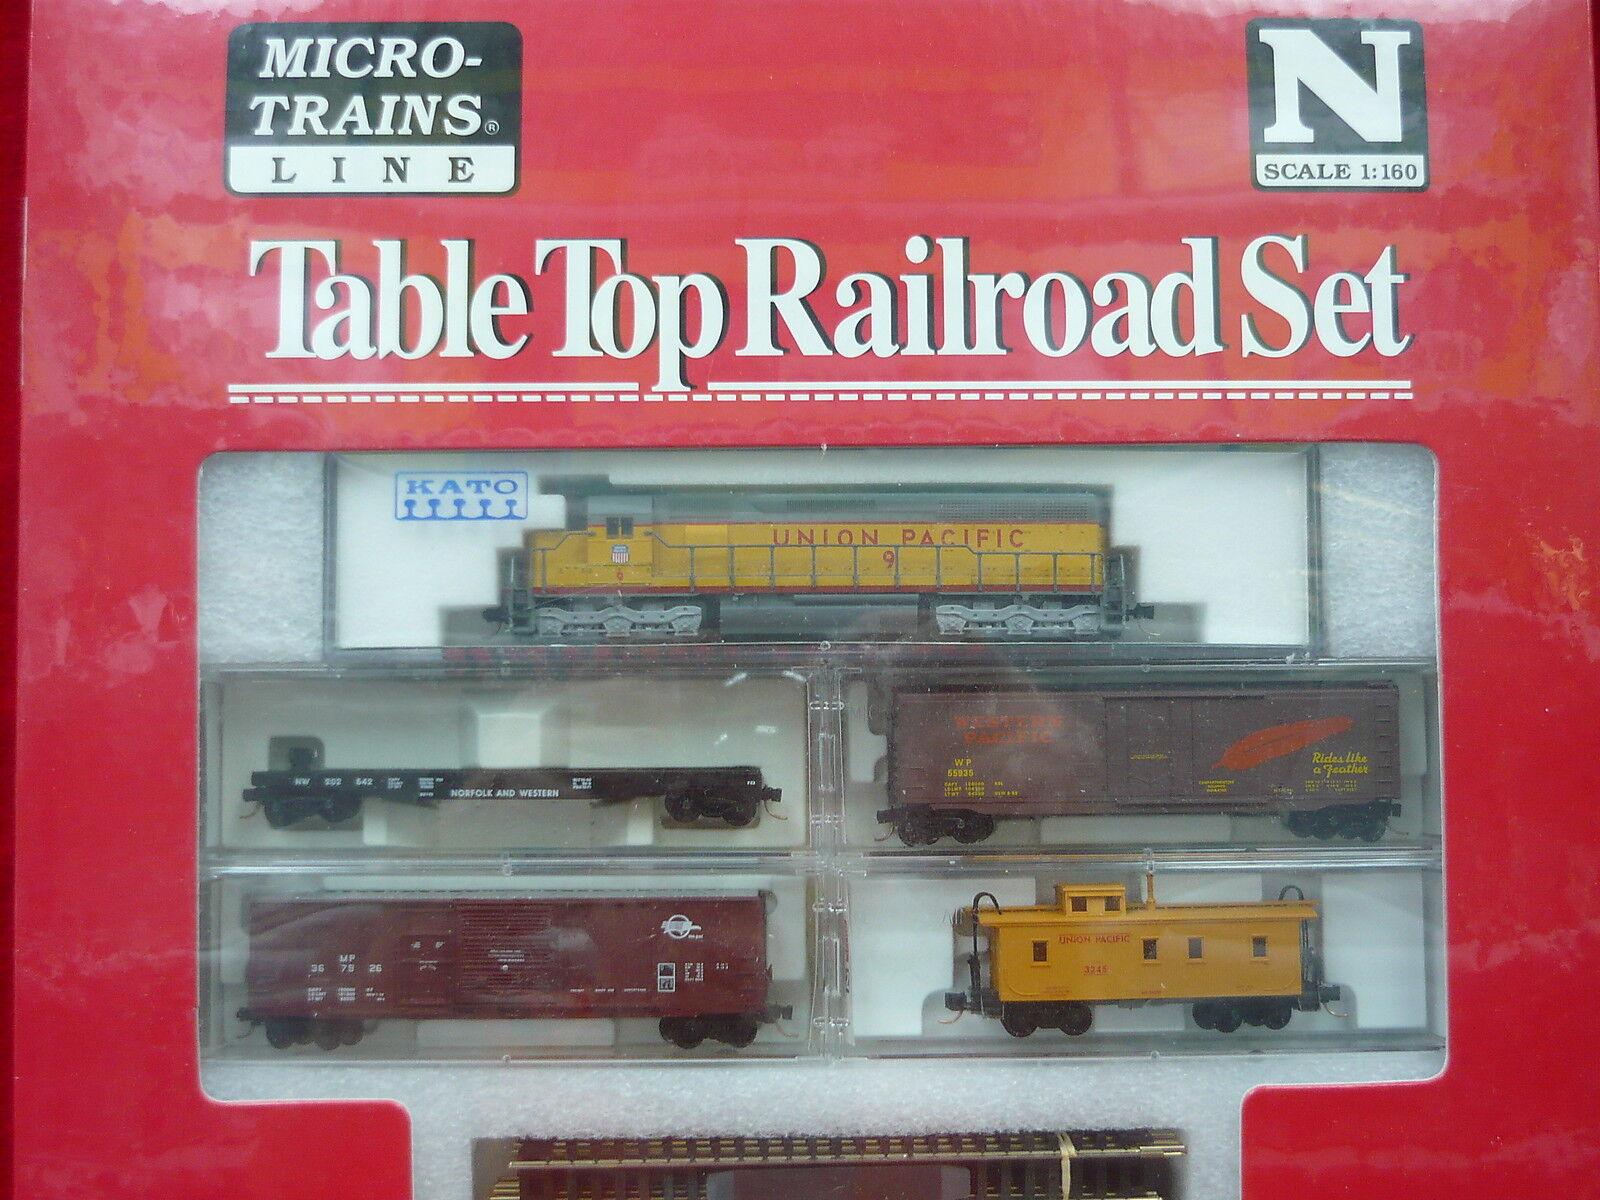 Union Pacific Kato SD-45 N Scale Micro-Trains Table Top Set NIB